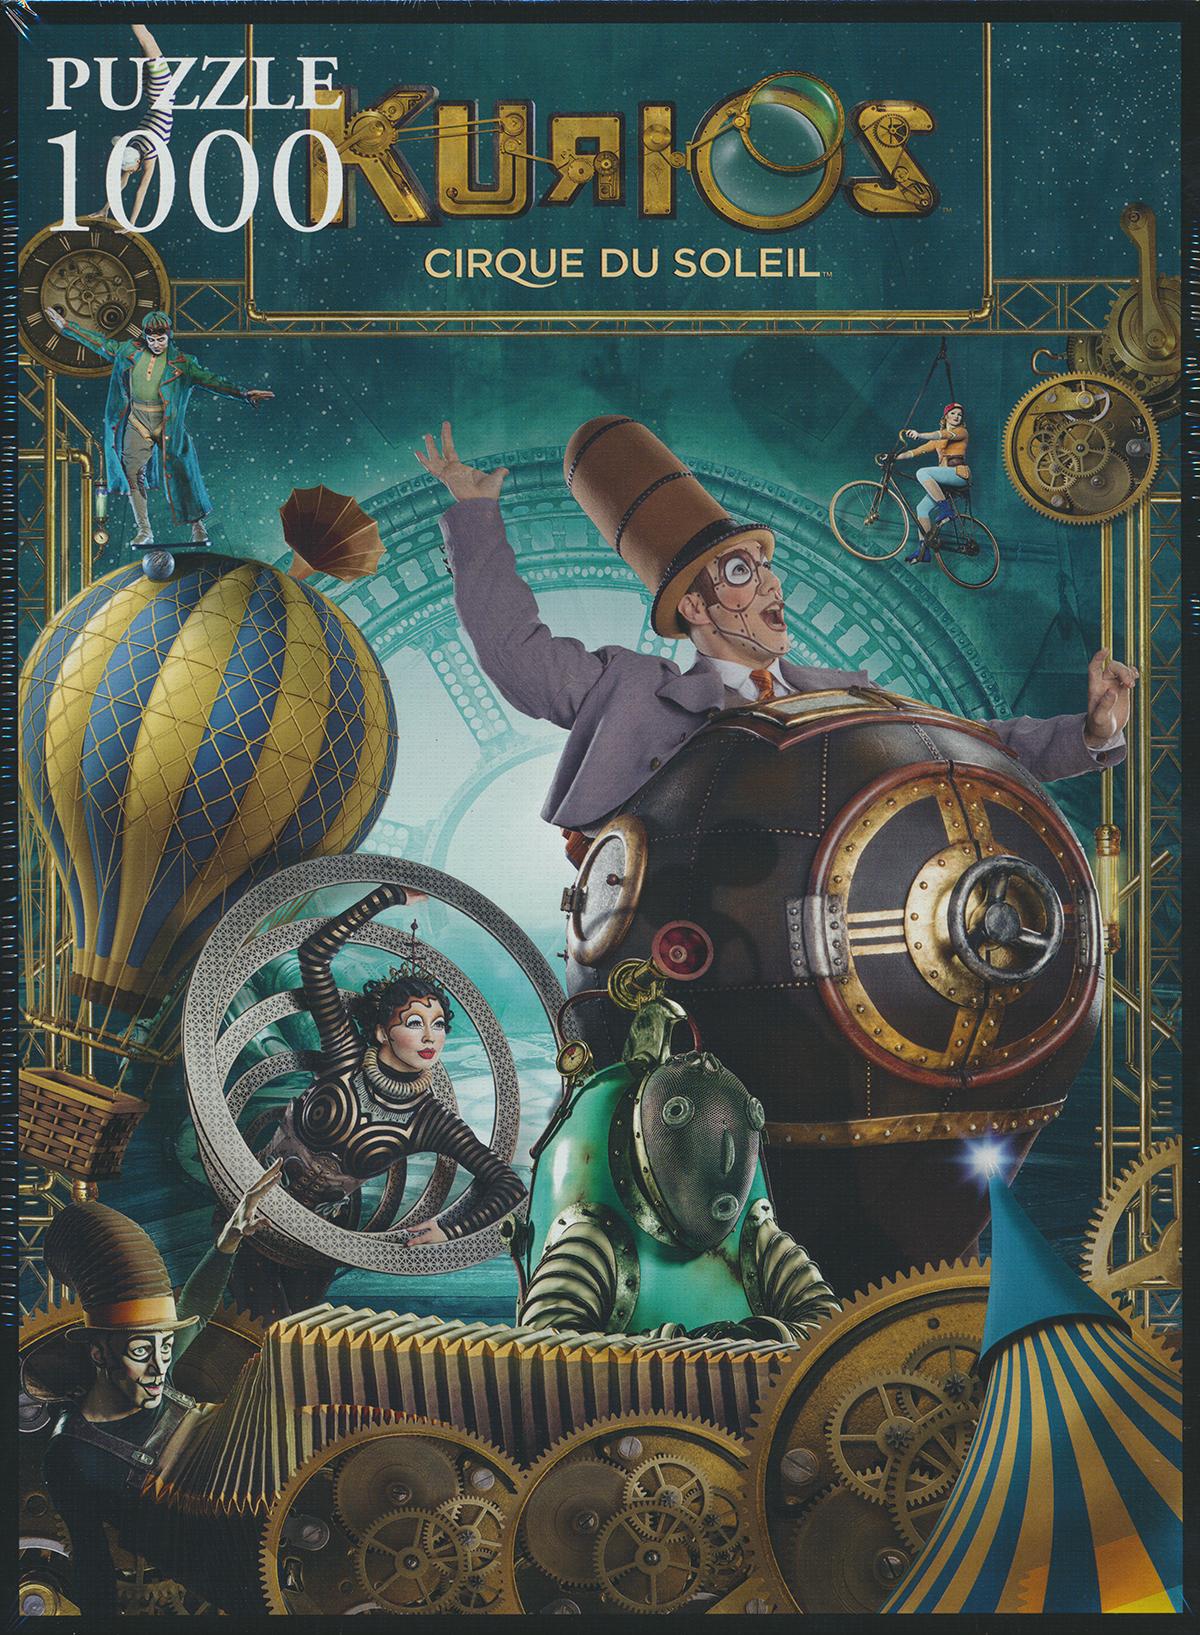 Trefl Jigsaw Puzzle 1000 Pieces kurios, cirque de soleil circus puzzel kurios-cirque-soleil